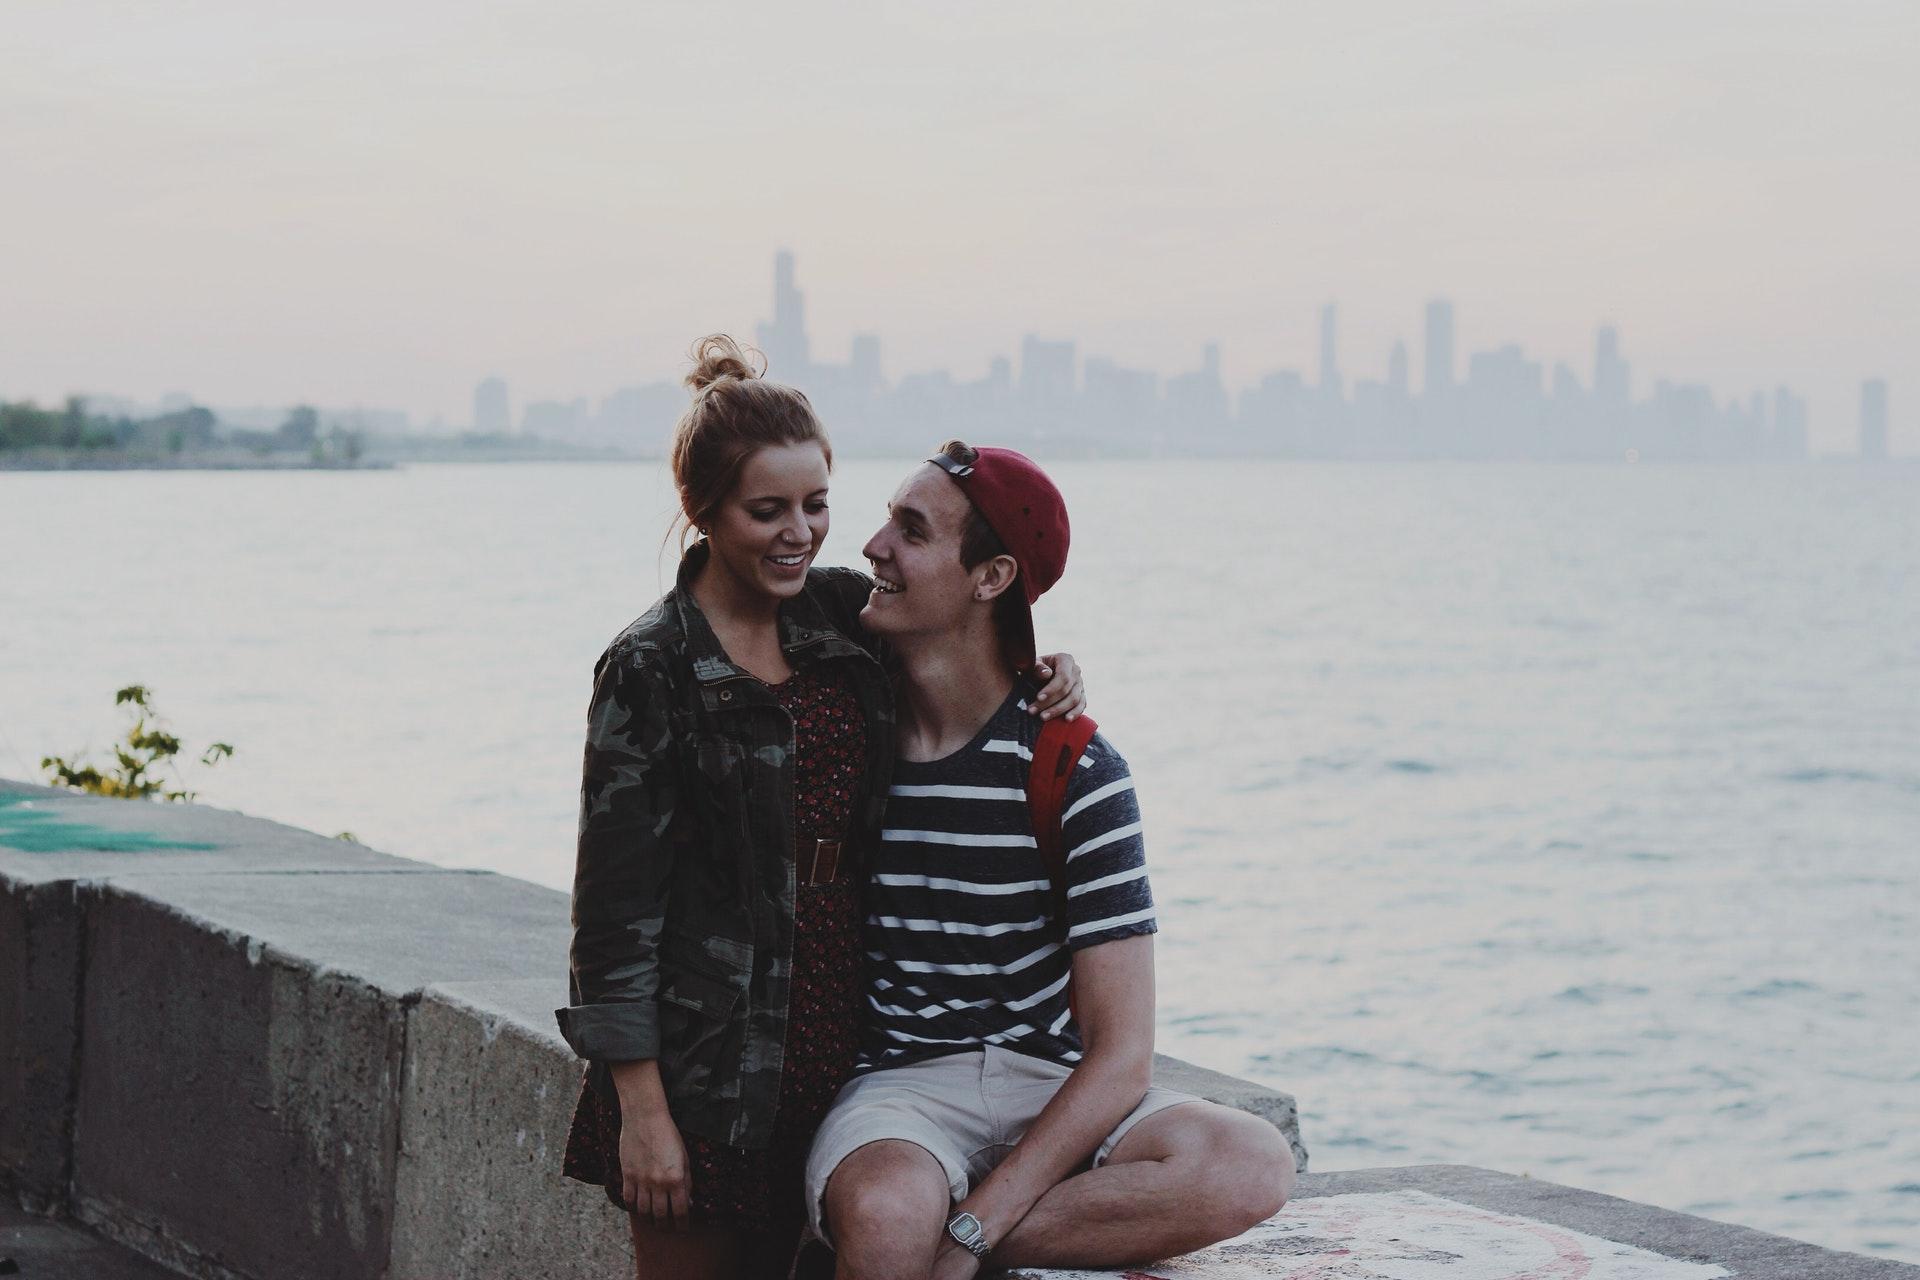 chicago-couple-date-6977.jpg